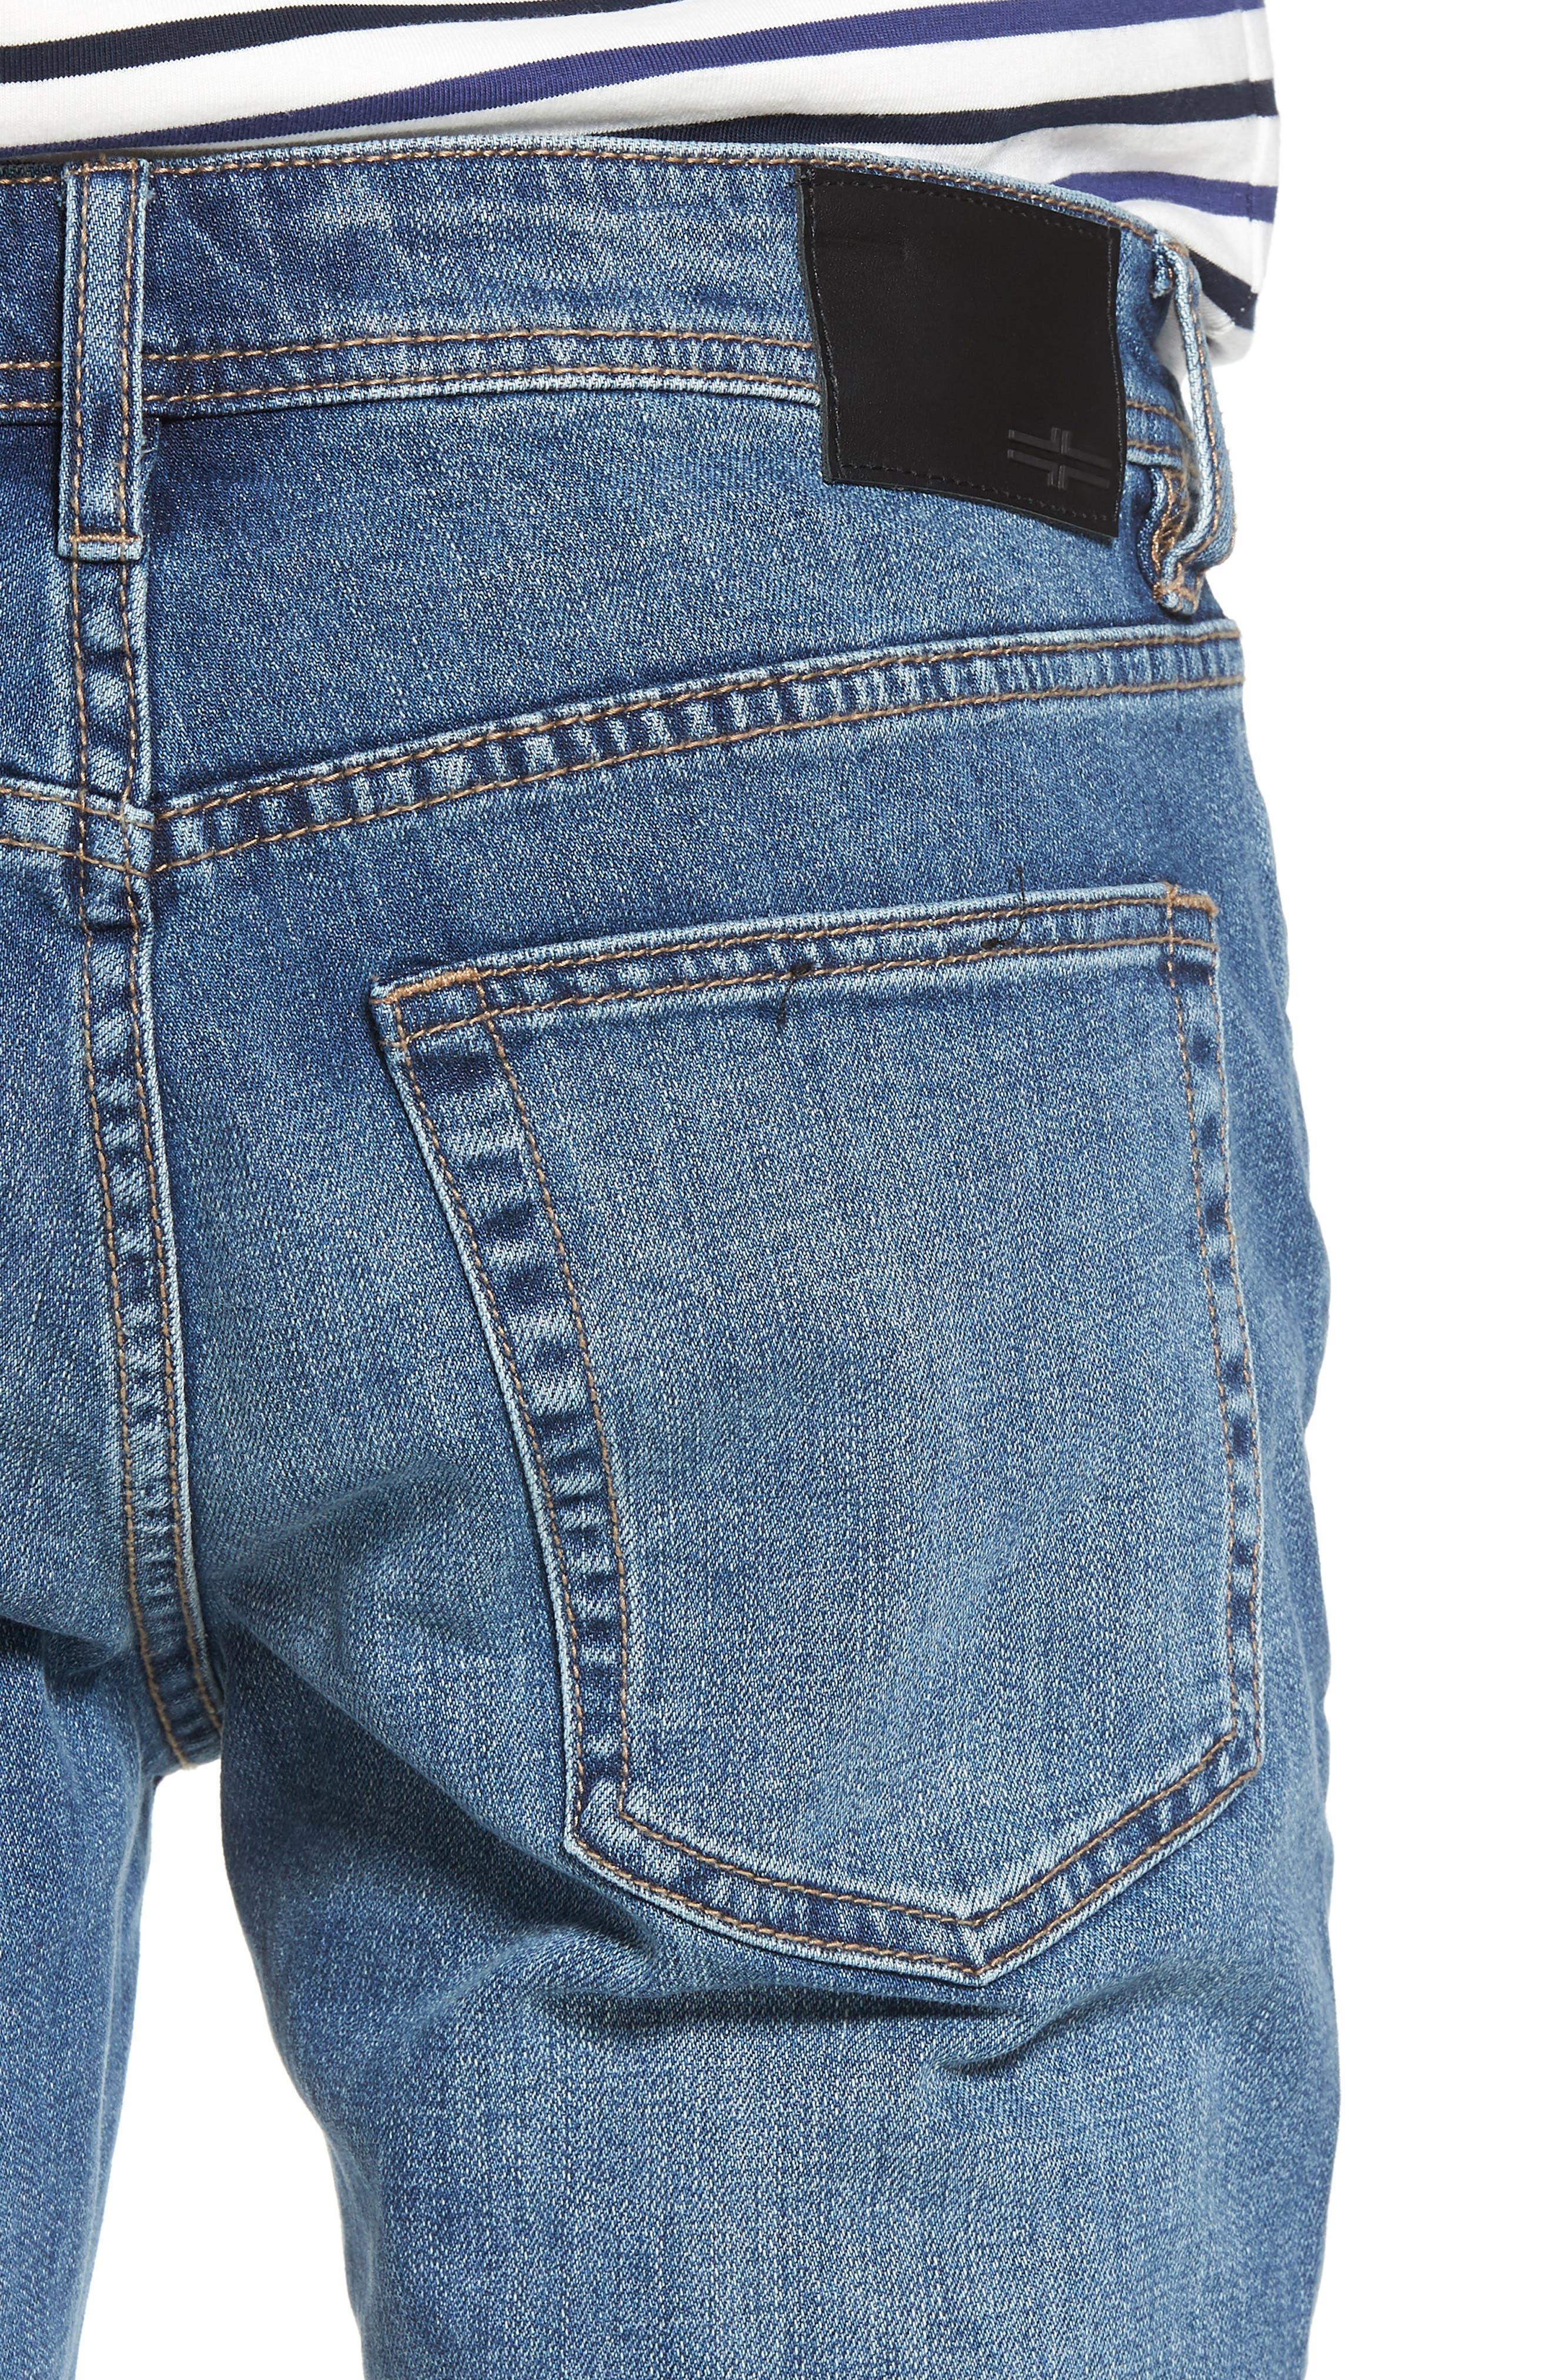 Jeans Co. Bond Skinny Fit Jeans,                             Alternate thumbnail 4, color,                             Bryson Vintage Medium